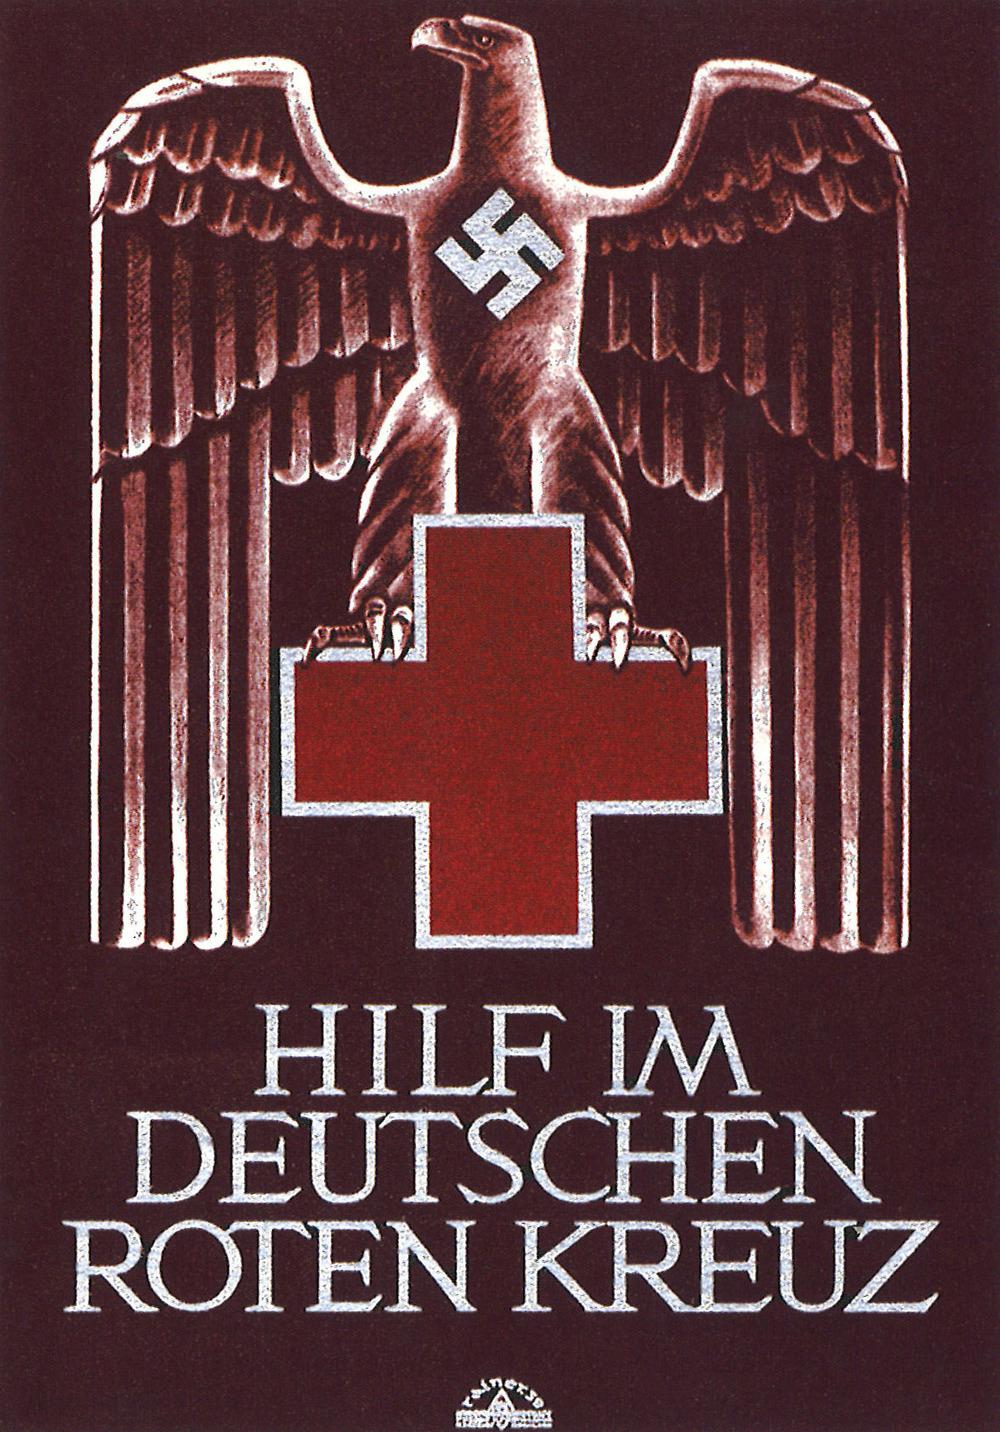 """Help the German Red Cross."" Germany 1941."